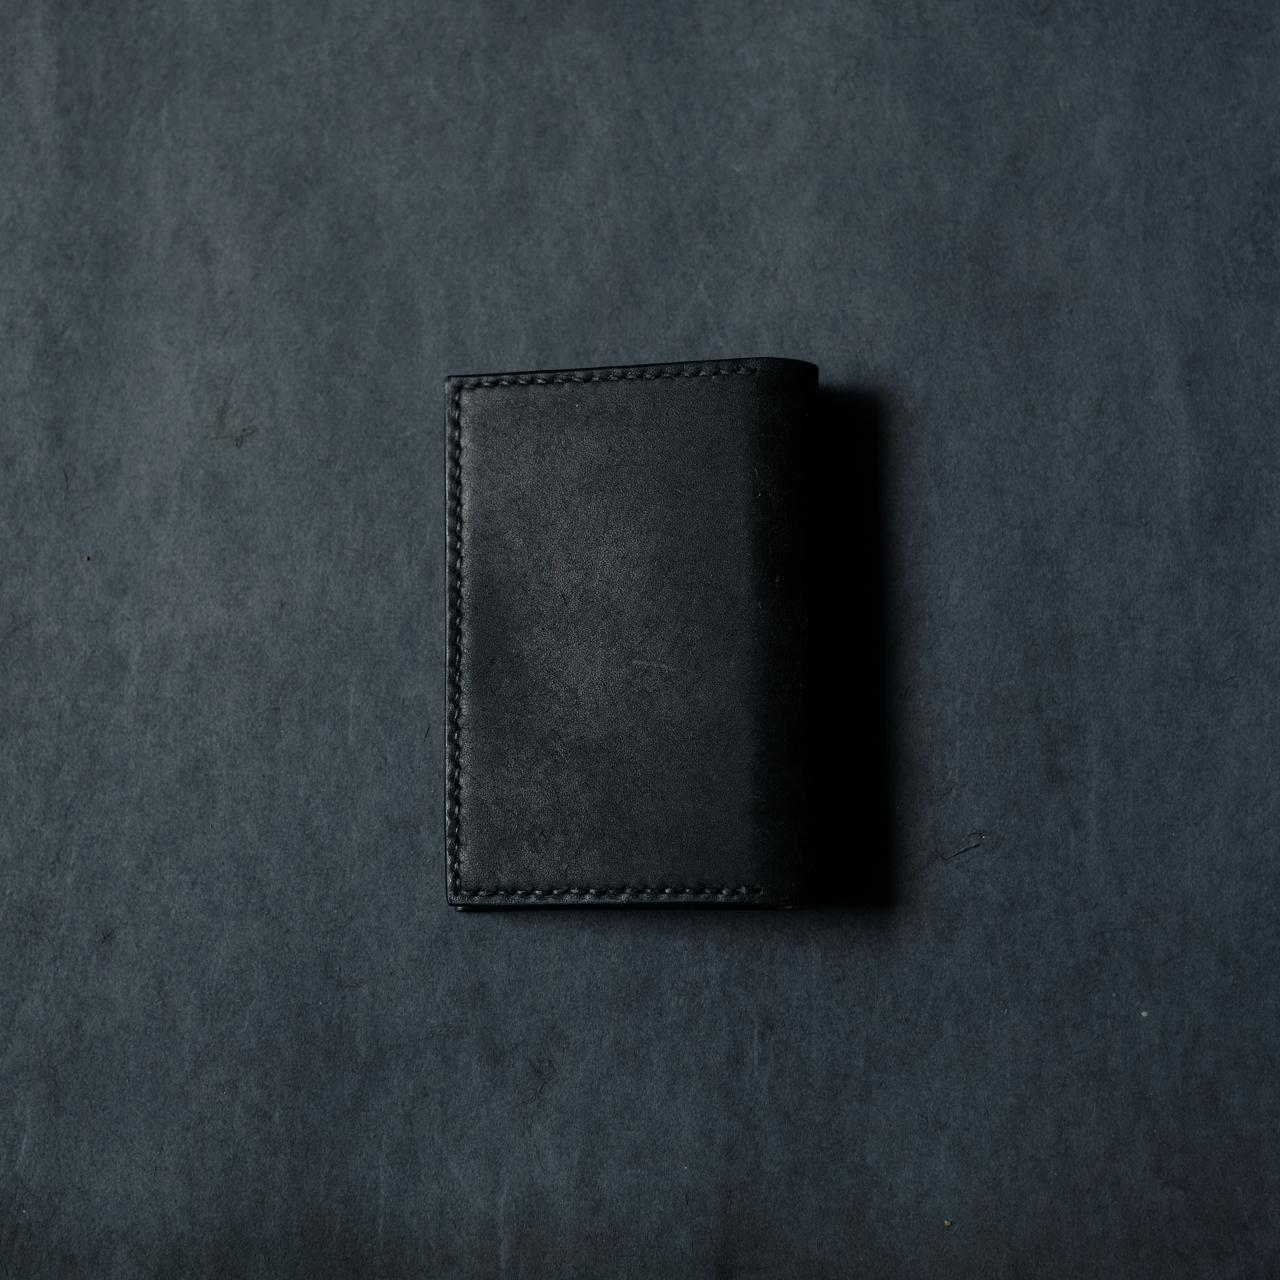 cardholder - 名刺入れ - bk - プエブロ